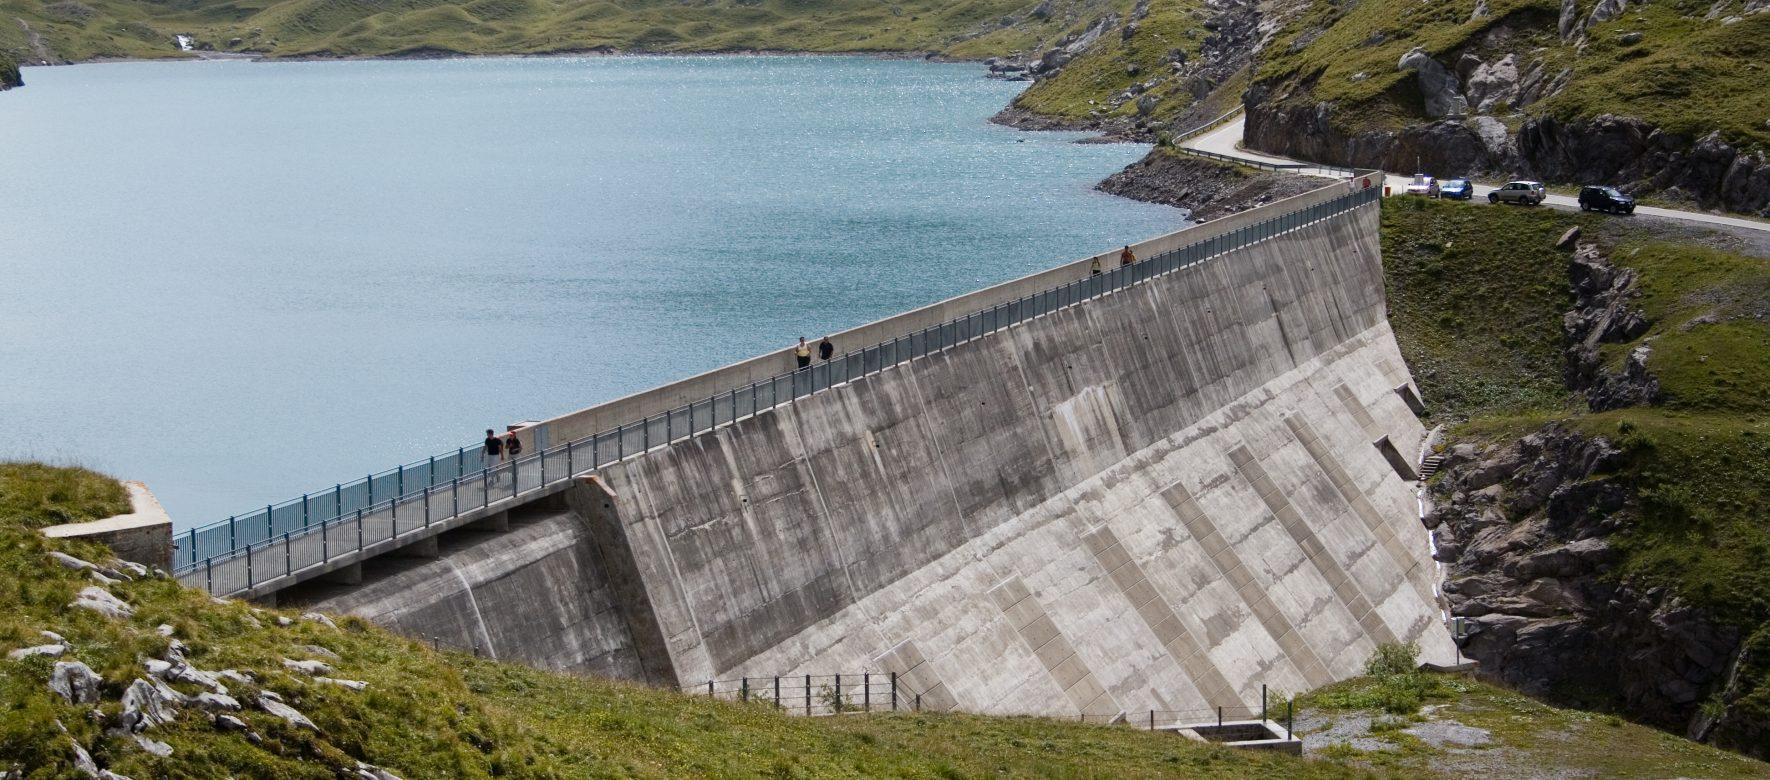 Le Qatar va investir 150 millions de dollars dans la construction d'un barrage hydraulique au Maroc